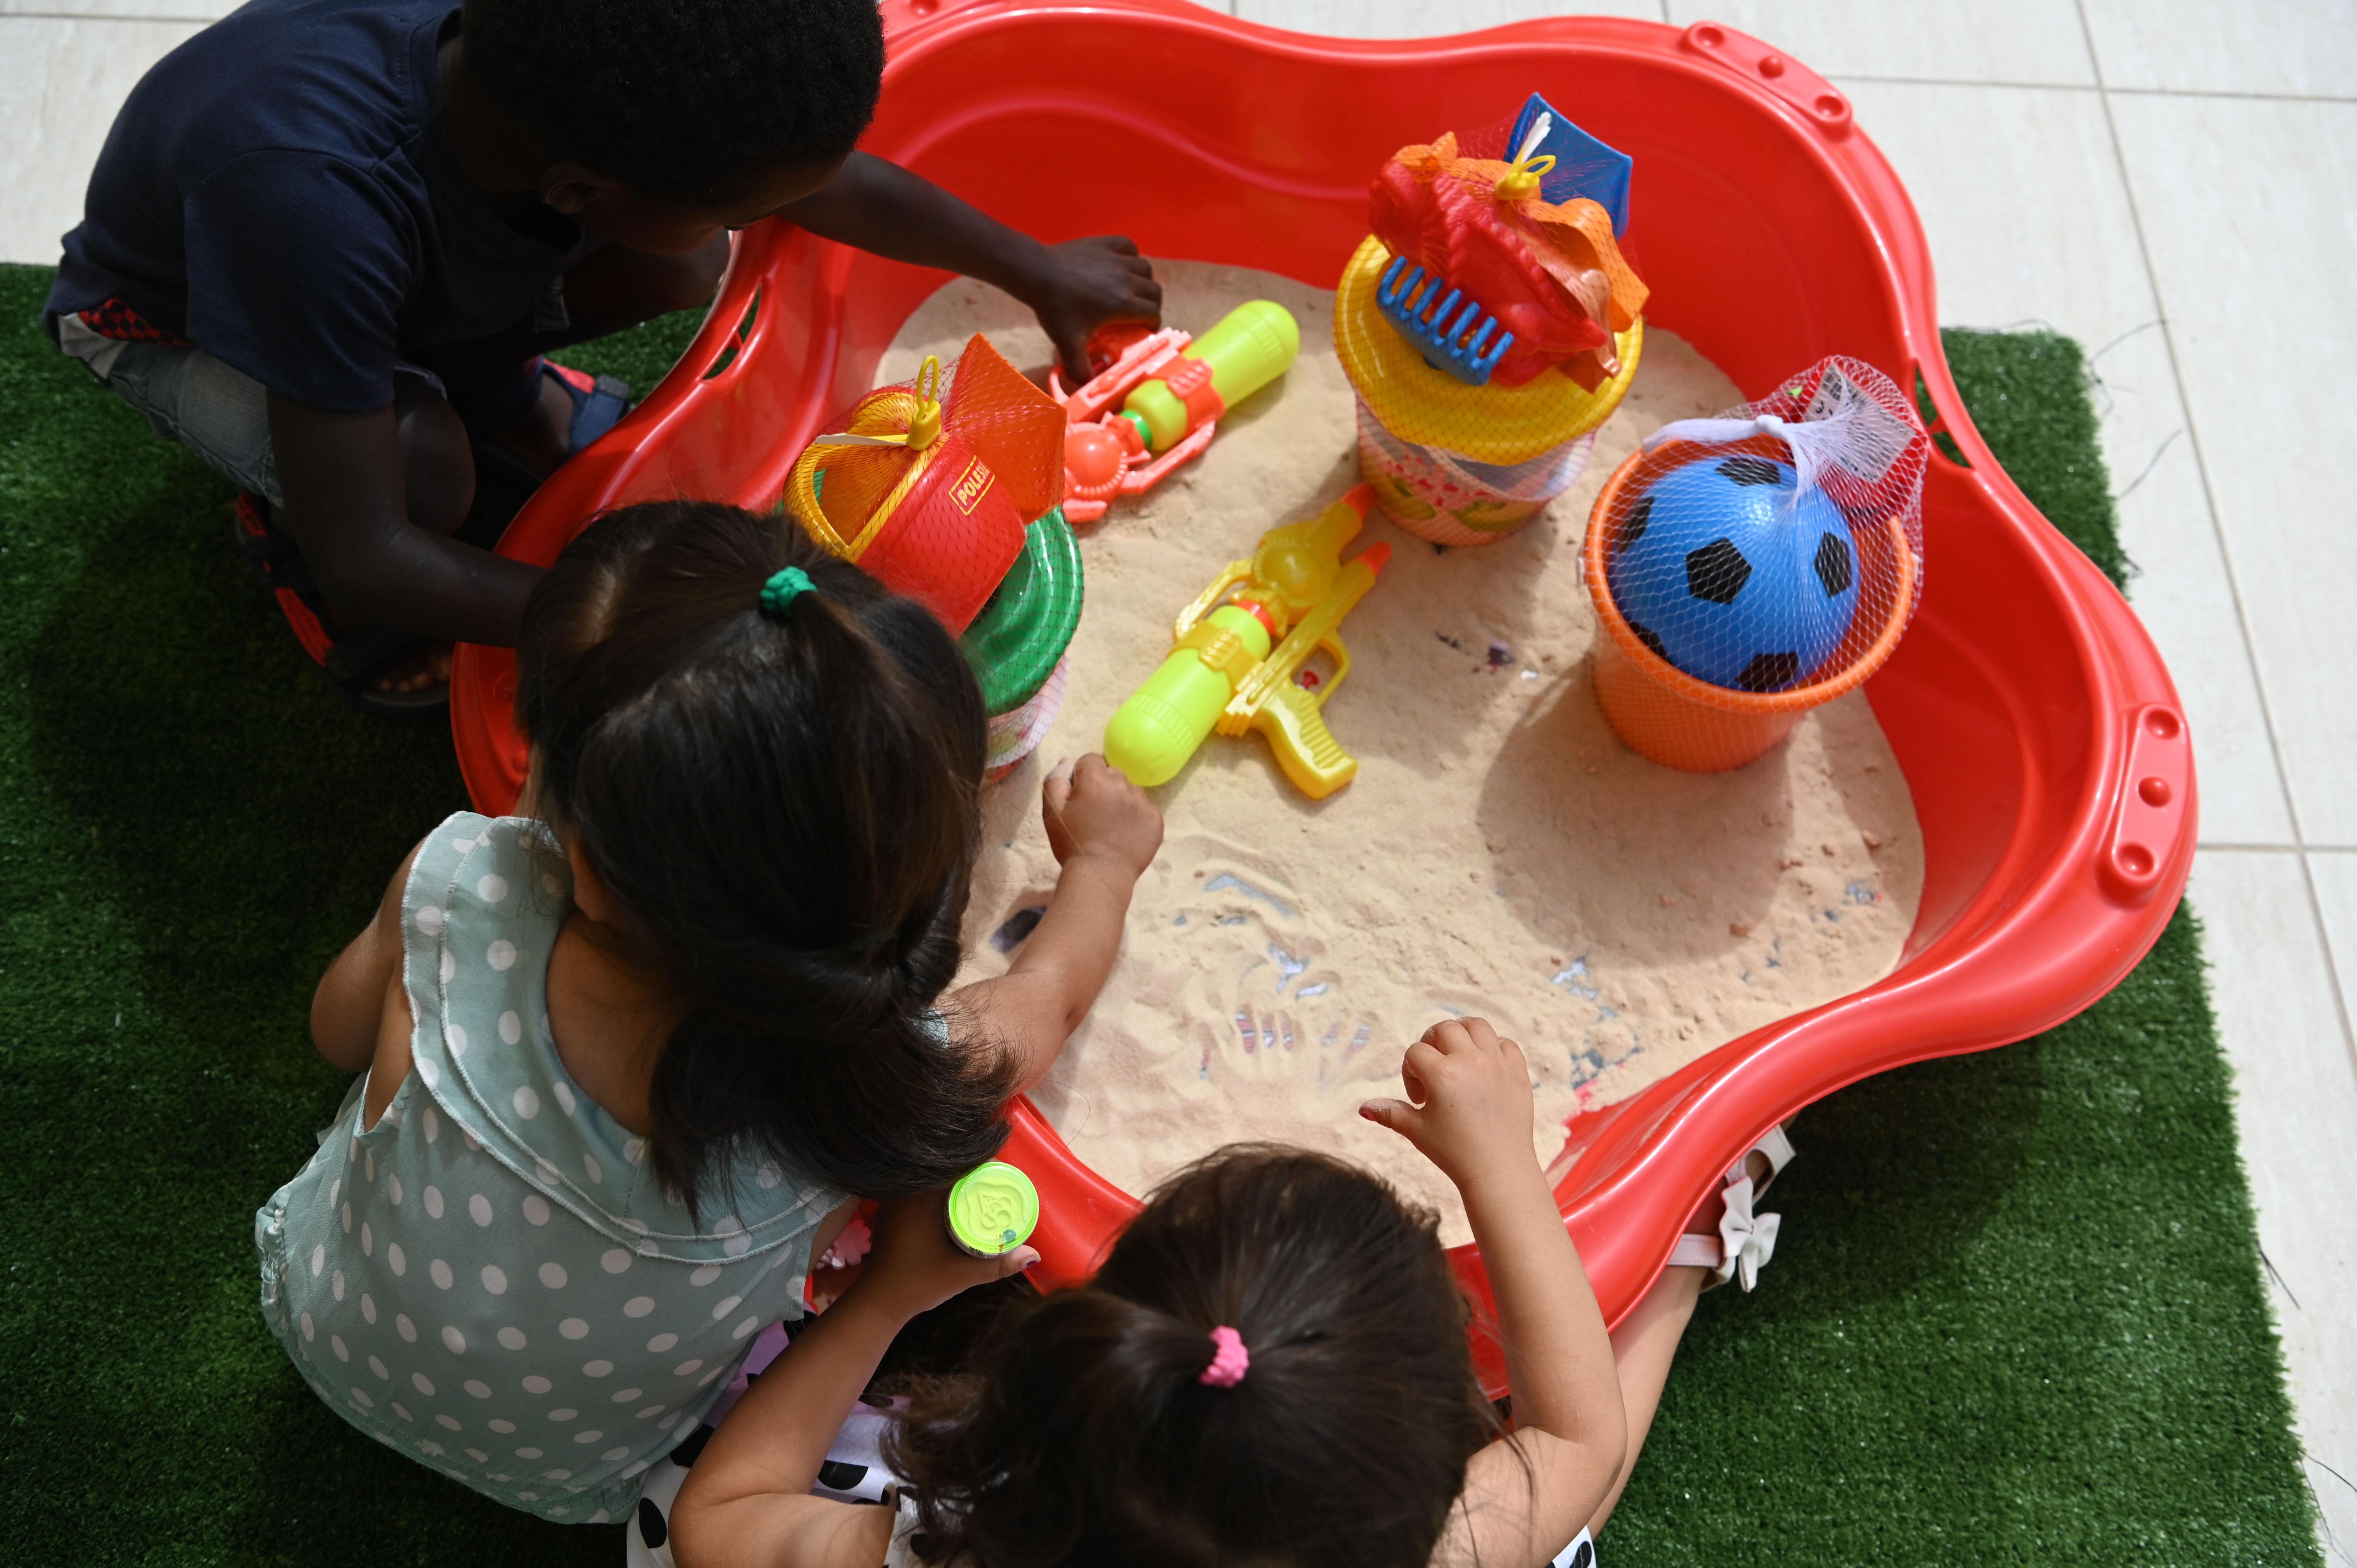 A new world of play opens up at Dar Santa Tereża